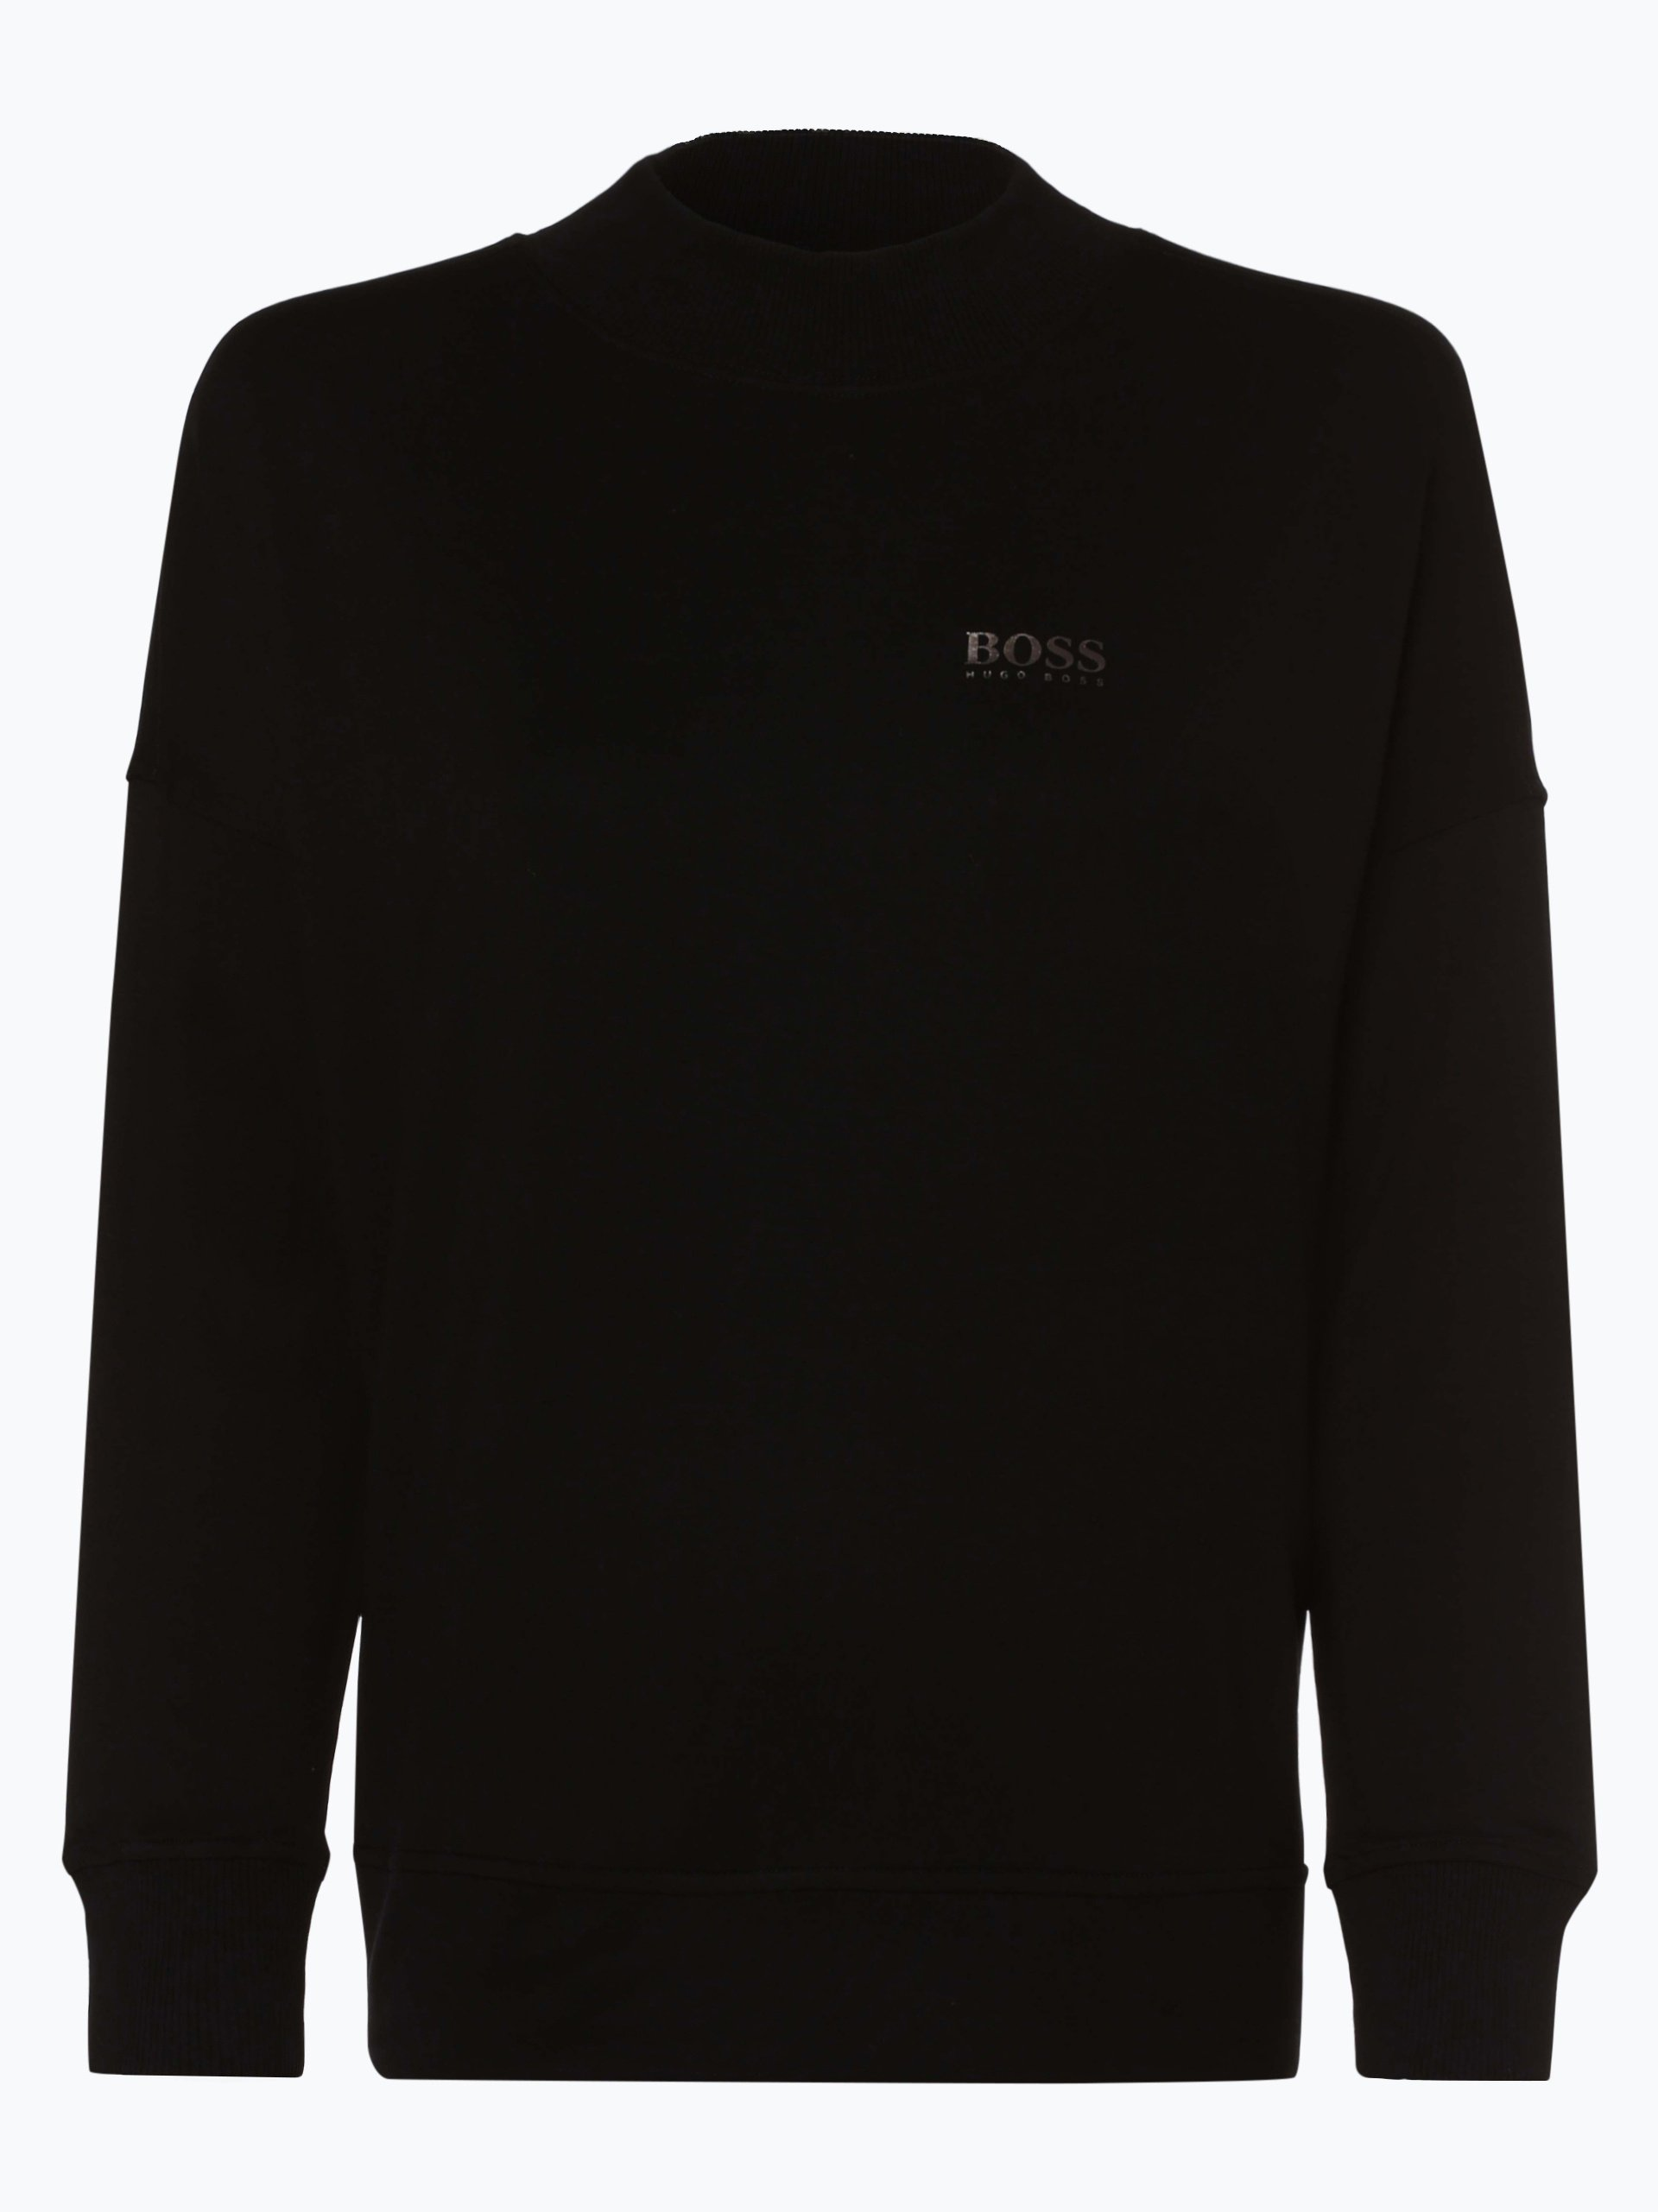 BOSS Casual Damen Sweatshirt - Teribneck